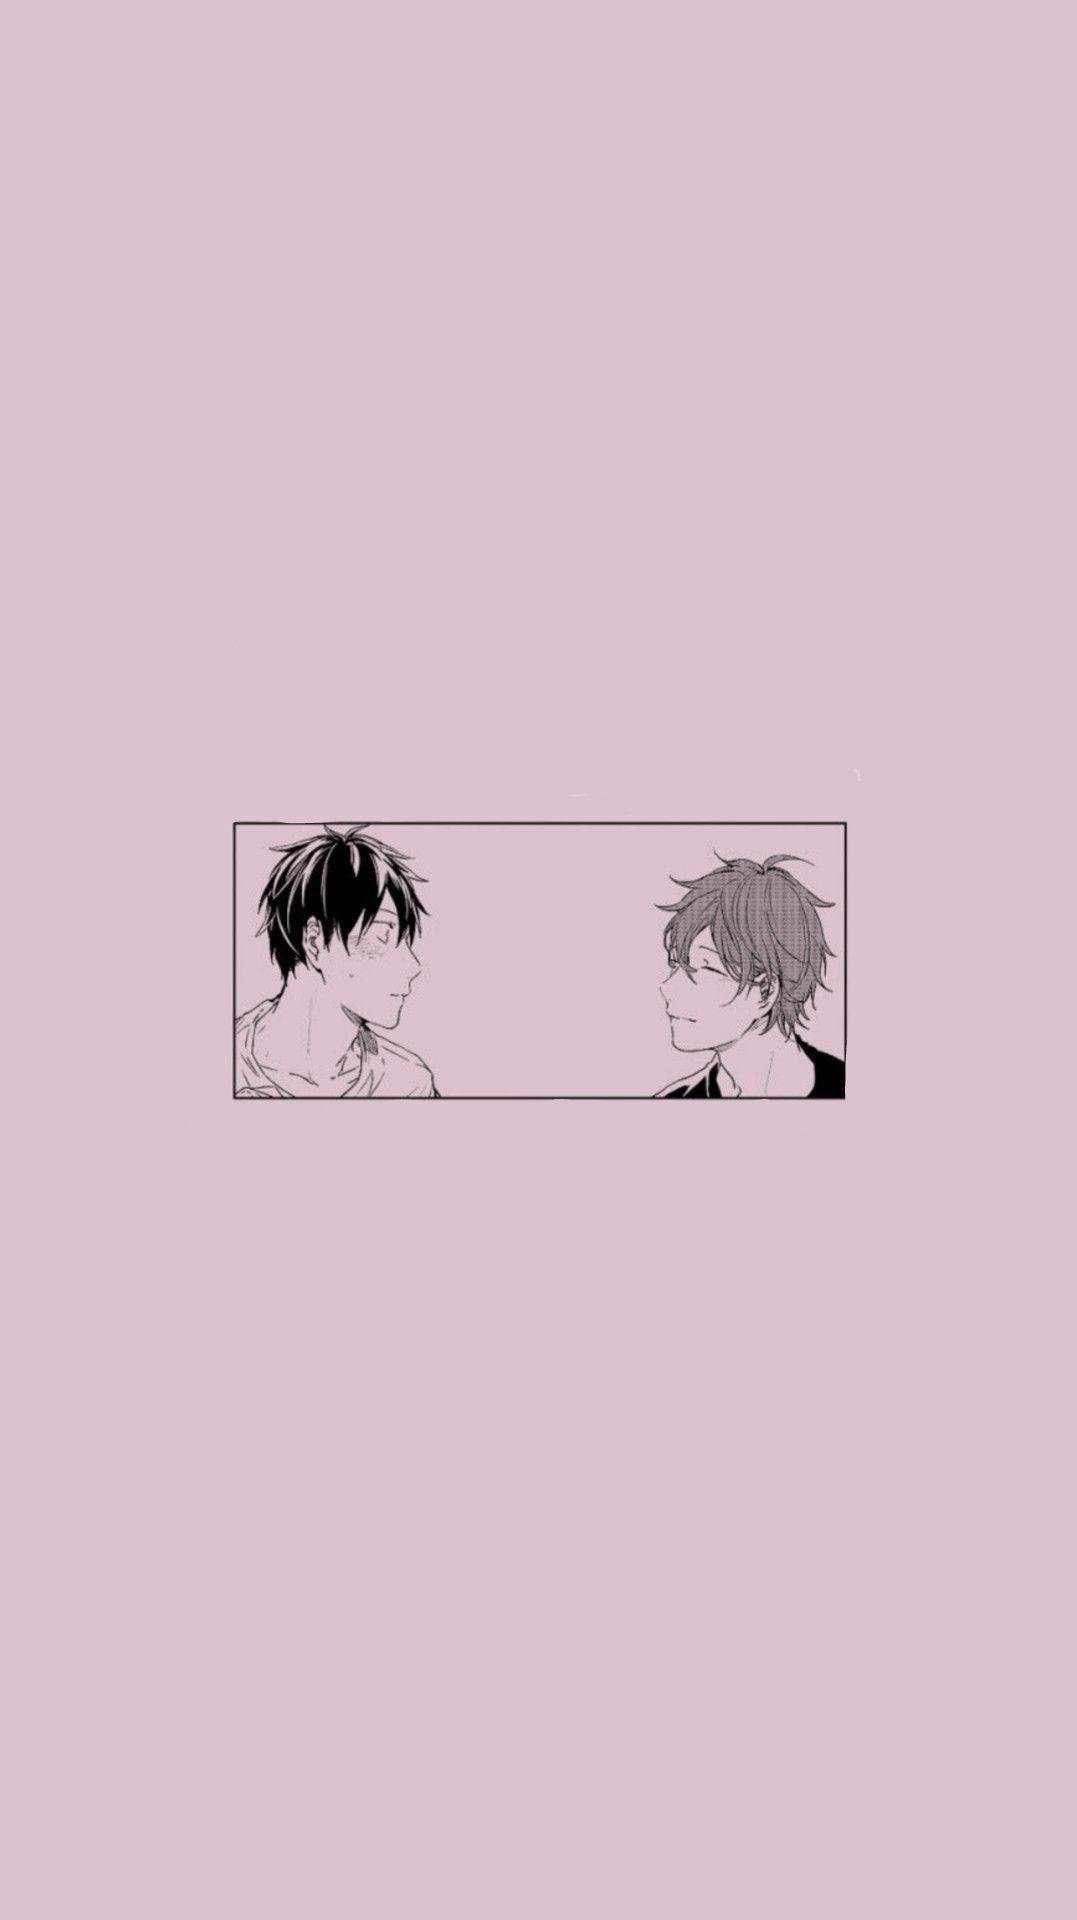 Uwu Given Lockscreens In 2021 Cute Anime Wallpaper Anime Wallpaper Iphone Anime Backgrounds Wallpapers